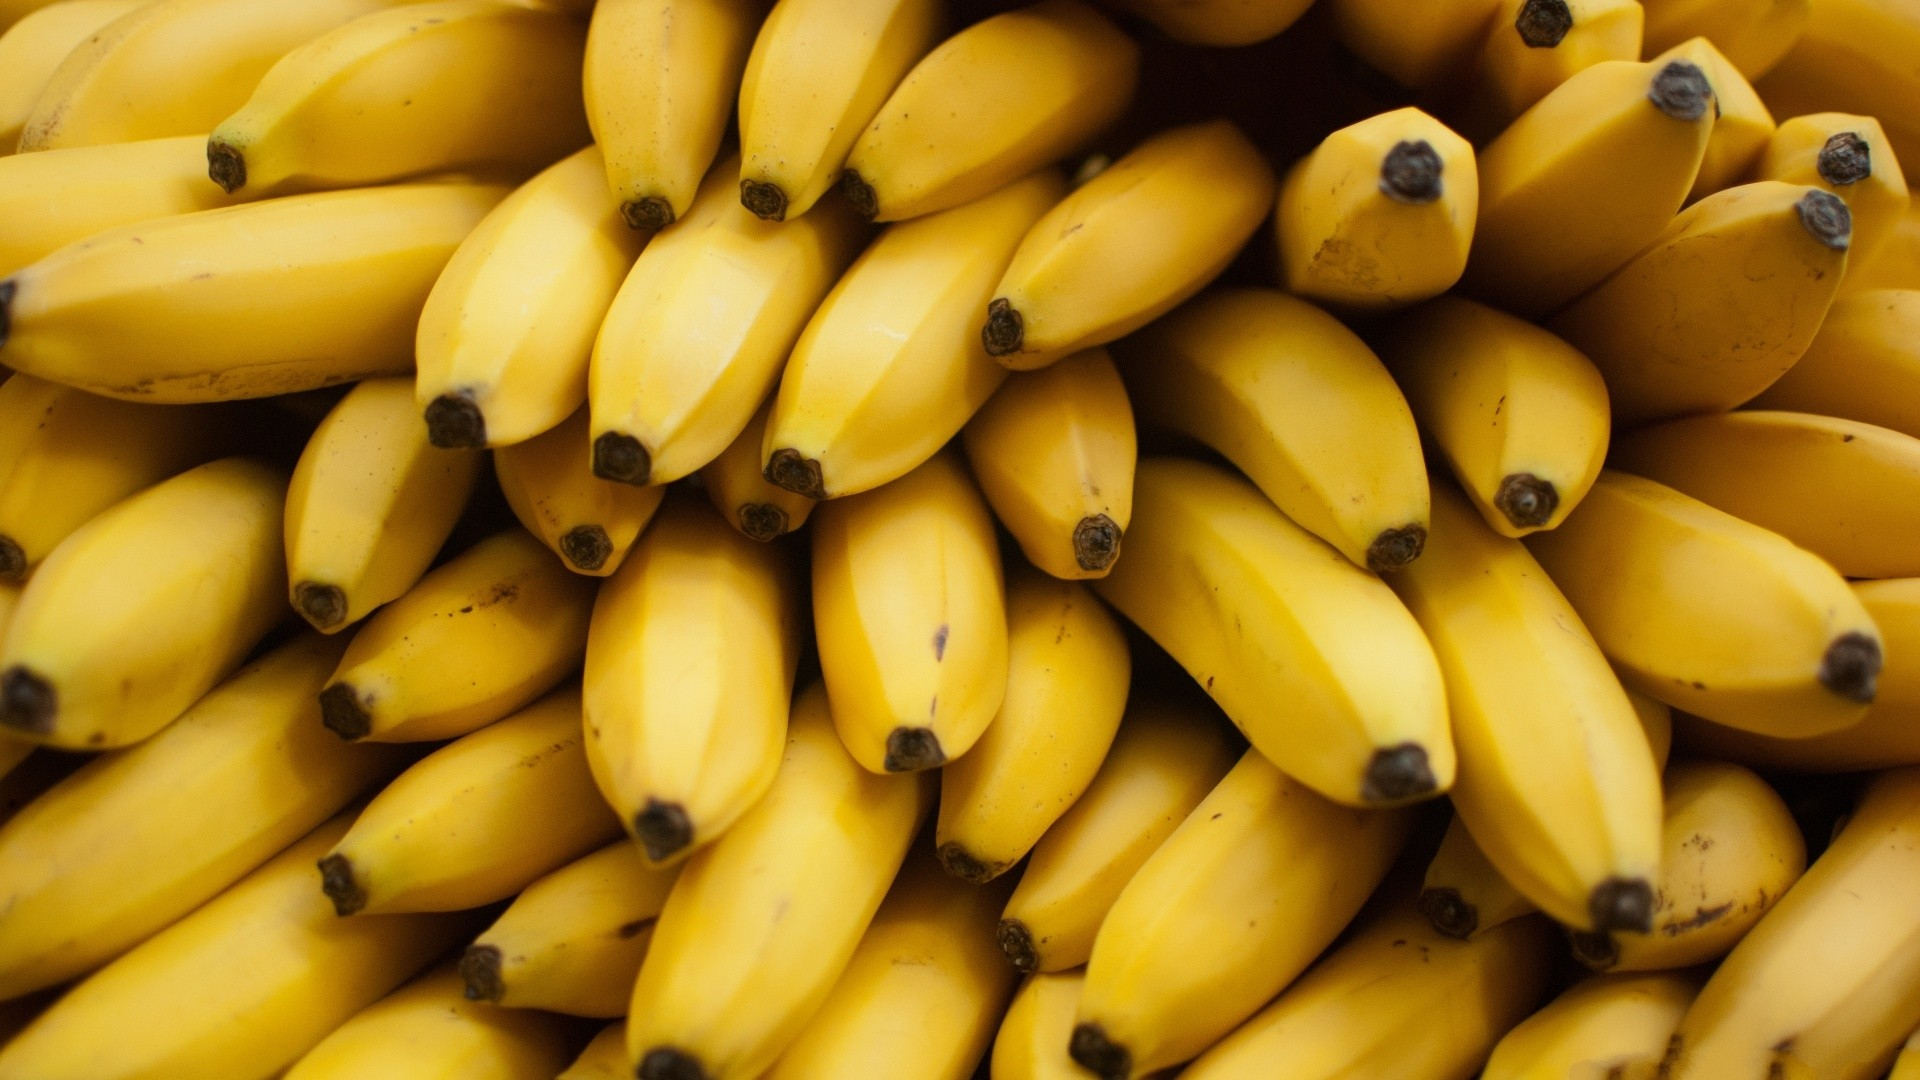 Banana wallpaper photo hd